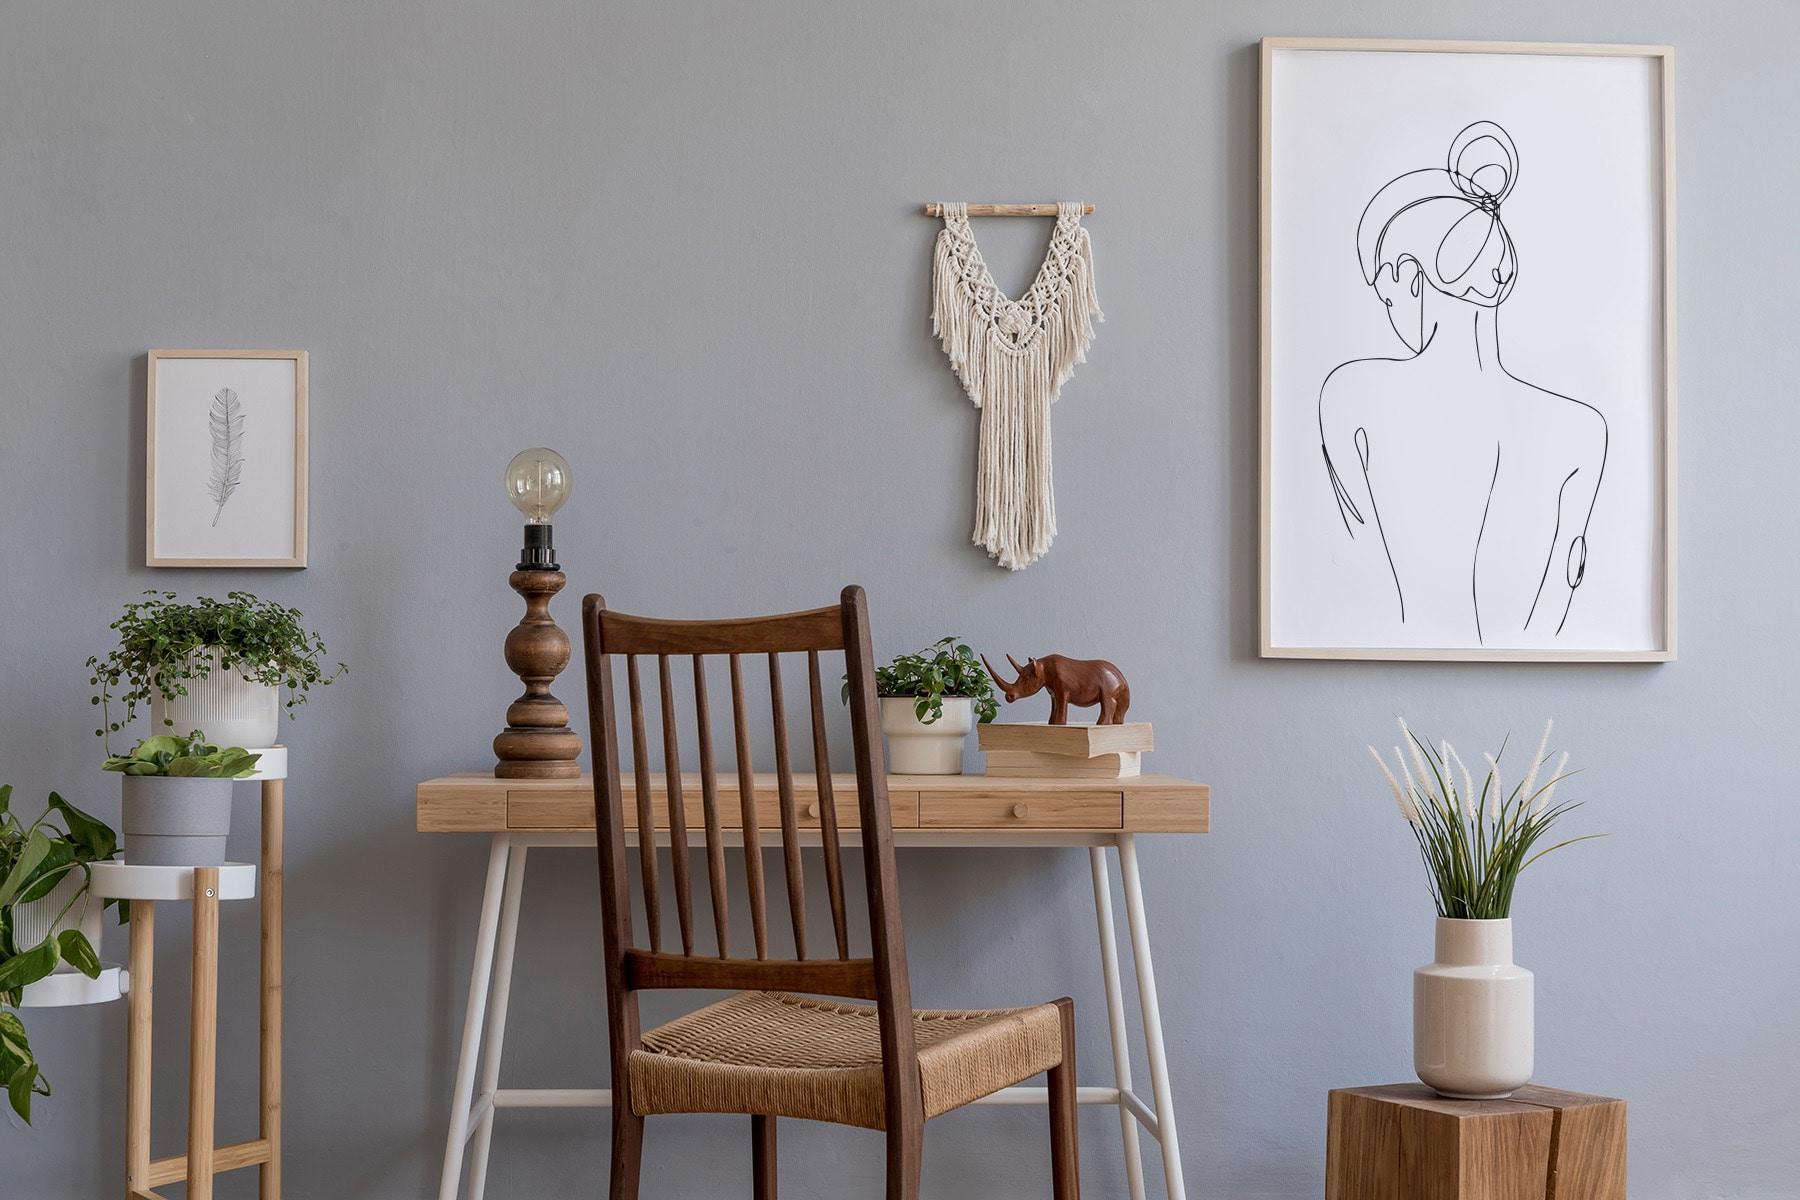 Plakaty - minimalizm